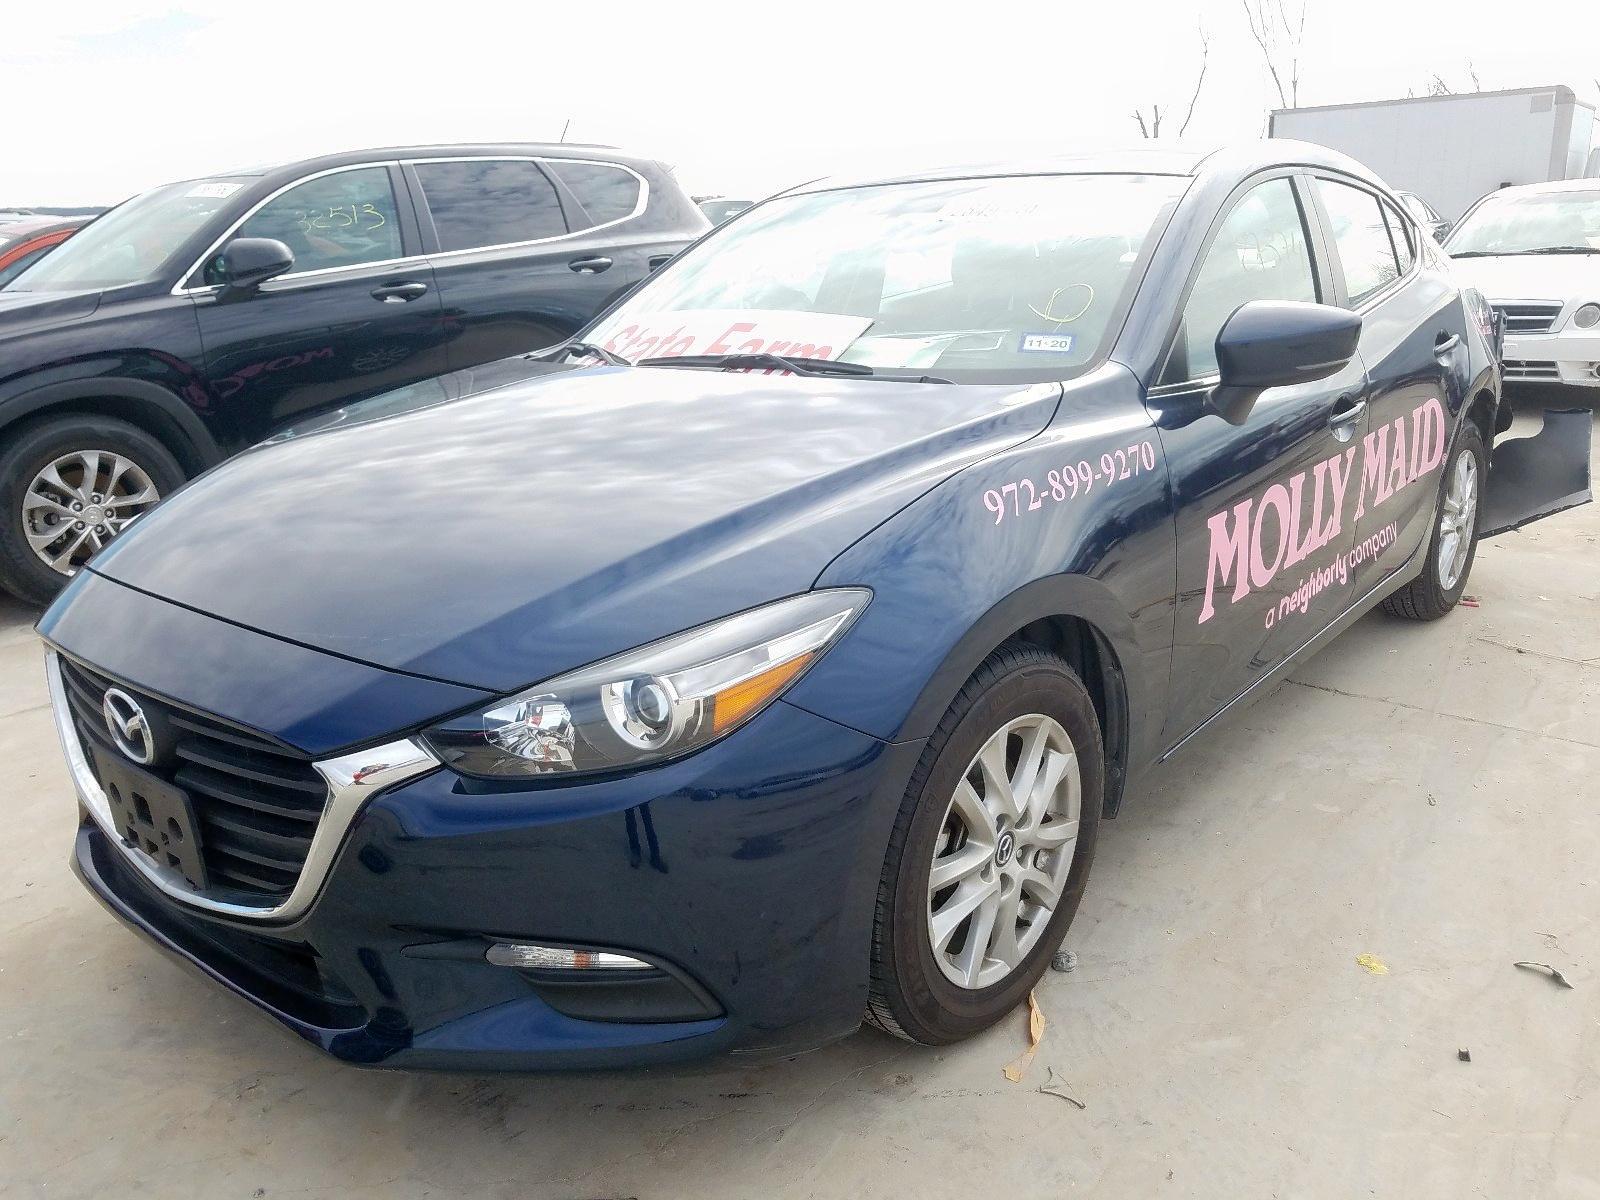 JM1BN1U78H1141704 - 2017 Mazda 3 Sport 2.0L Right View